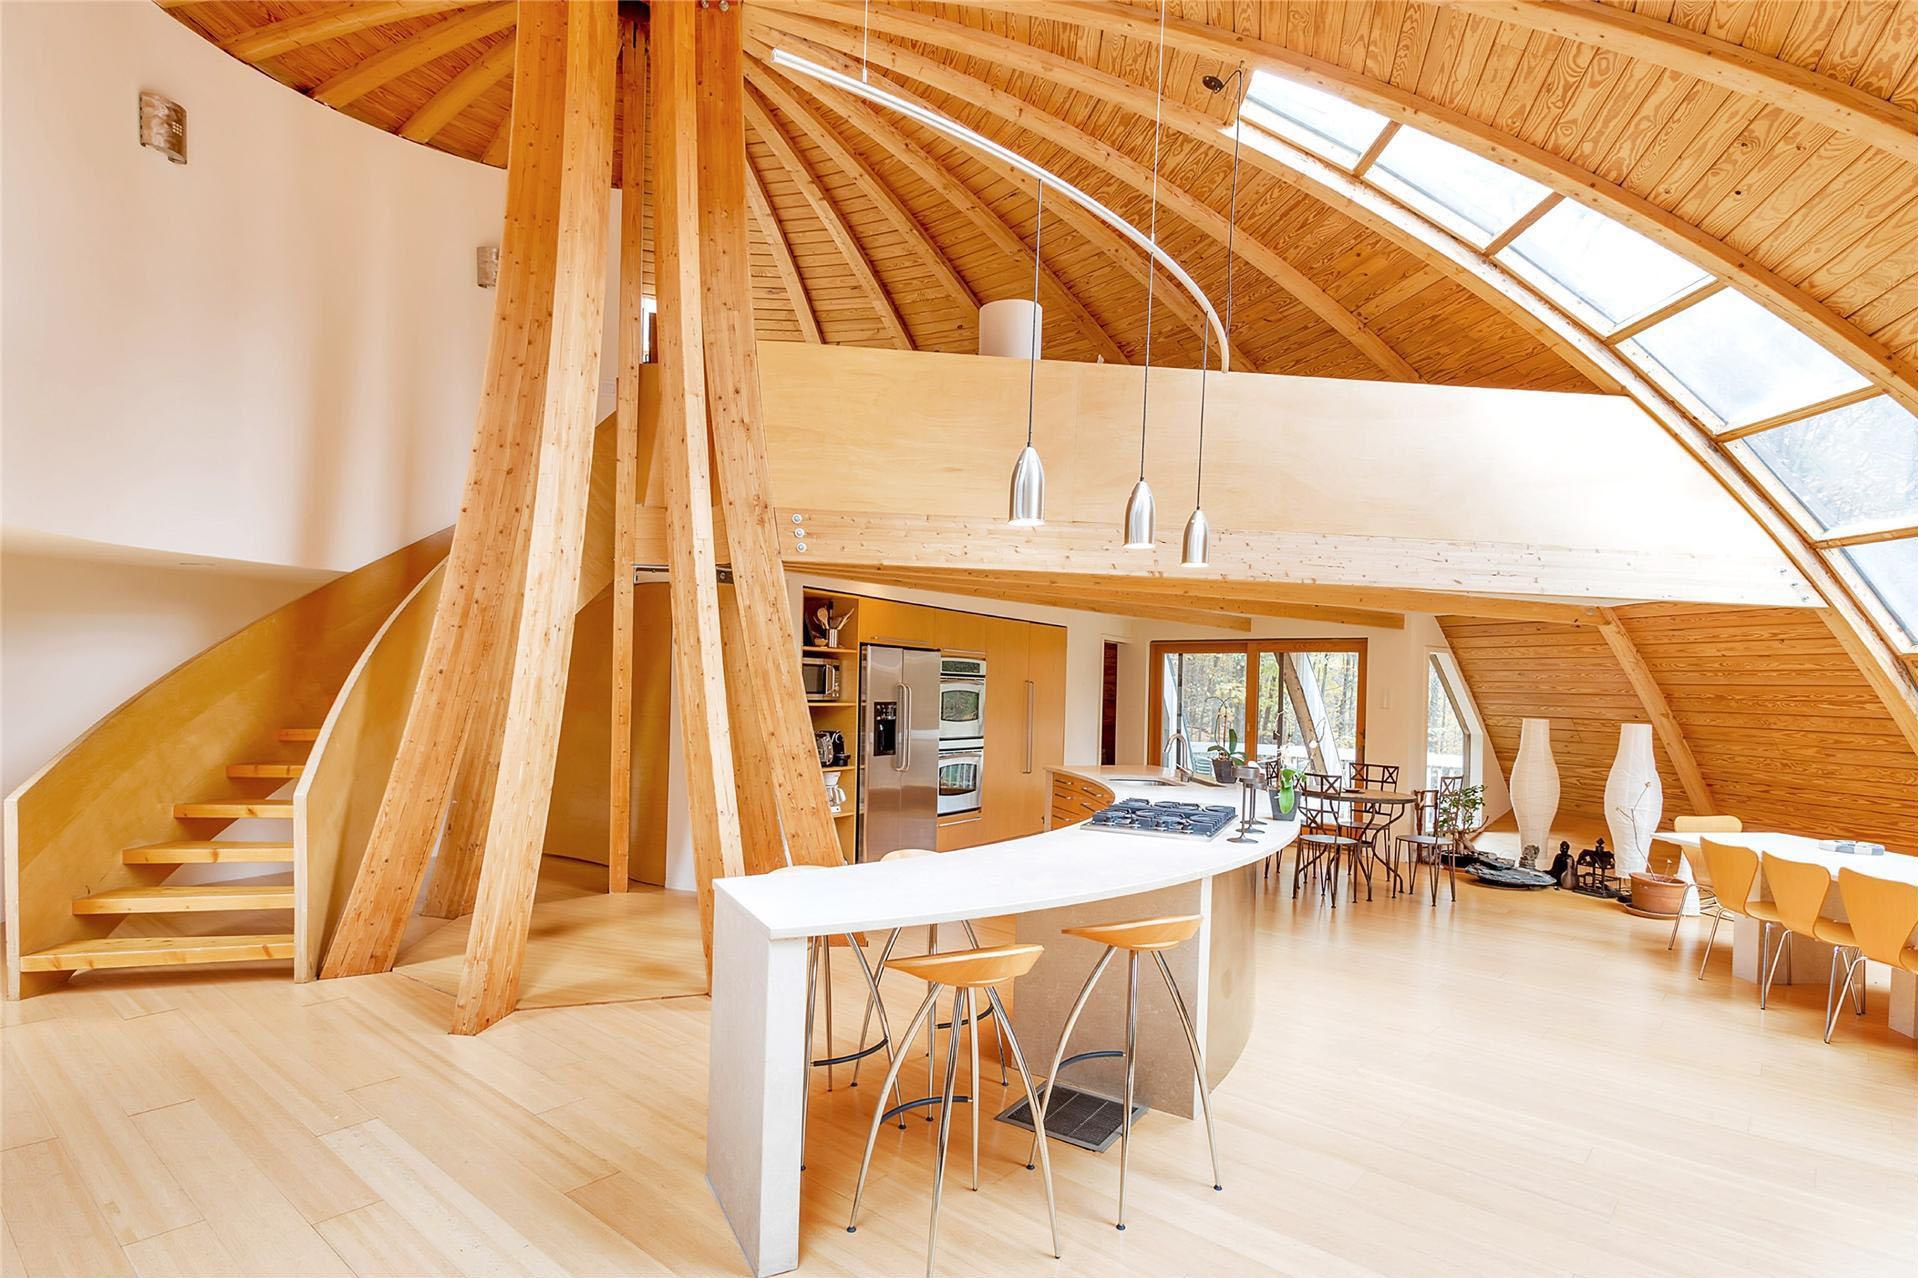 Interior design dome home - 116 Canaan Road Dome Home_7